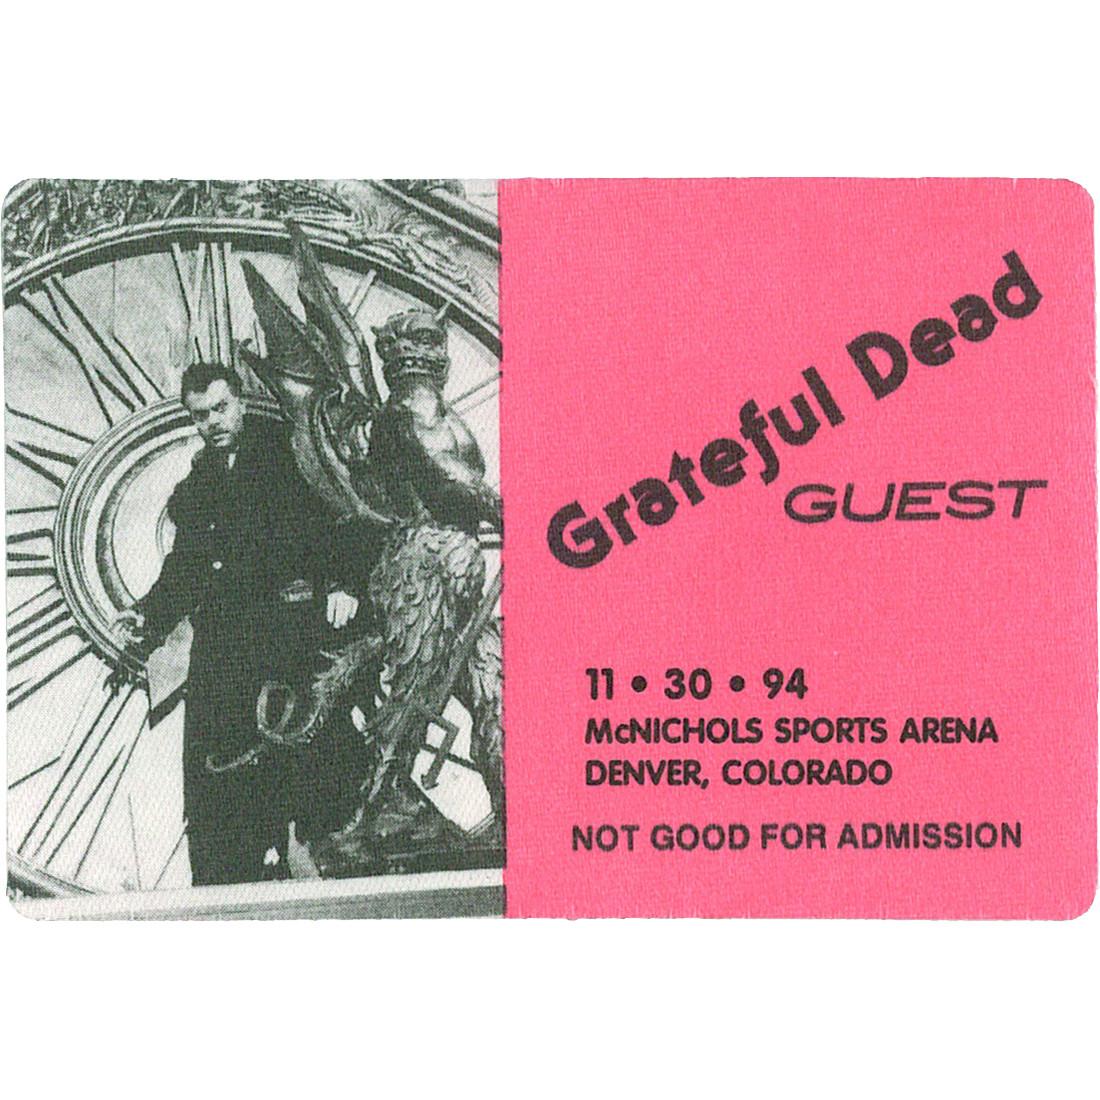 Grateful Dead 1994 11-30 Backstage Pass